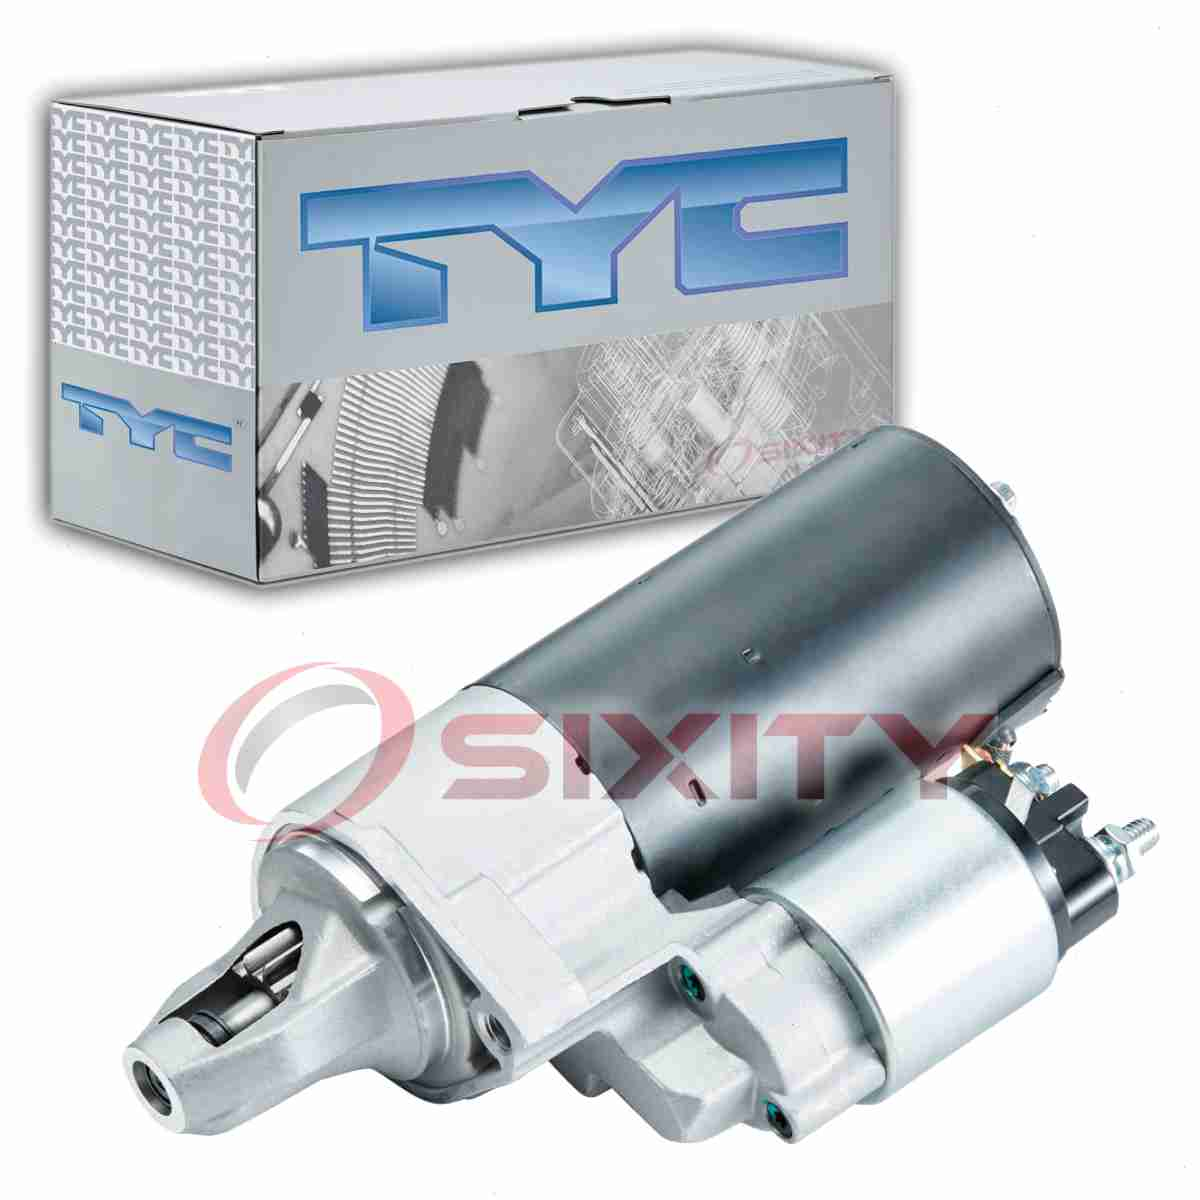 TYC Starter Motor for 1994-2000 GMC C2500 5.7L V8 7.4L V8 vo